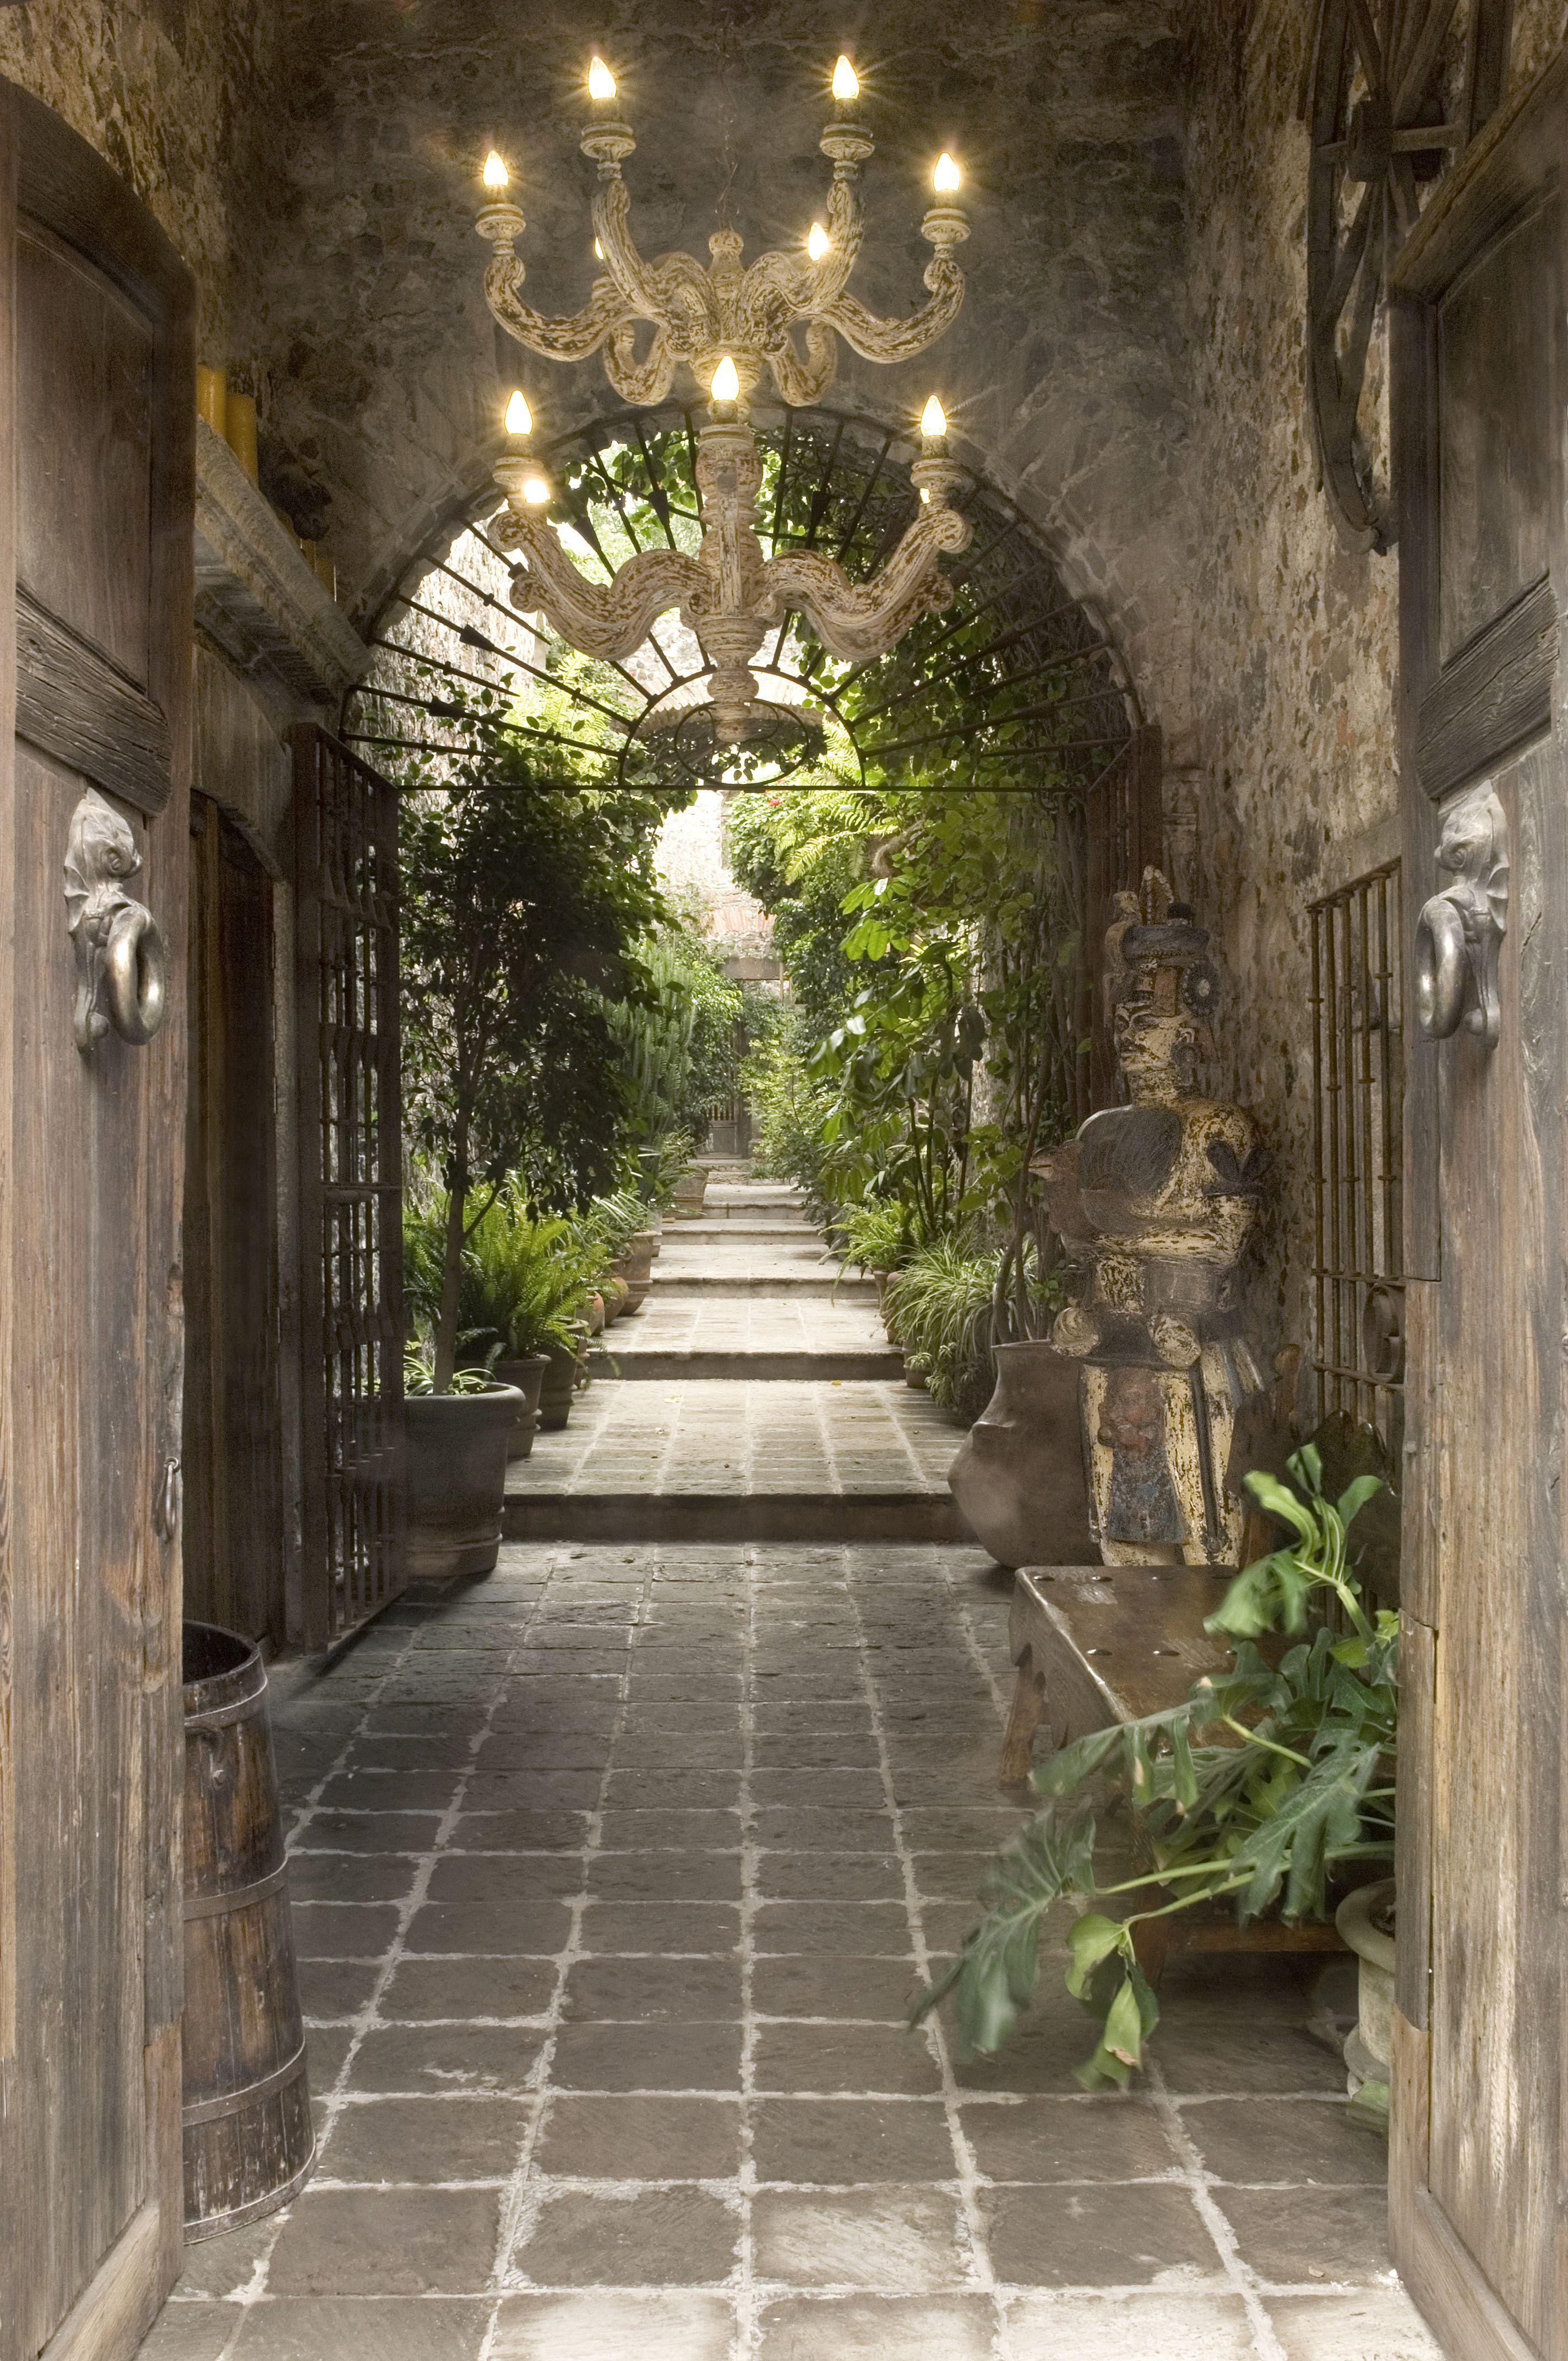 La casa dragones in san miguel de allende mexico house for Courtyard landscaping pinterest